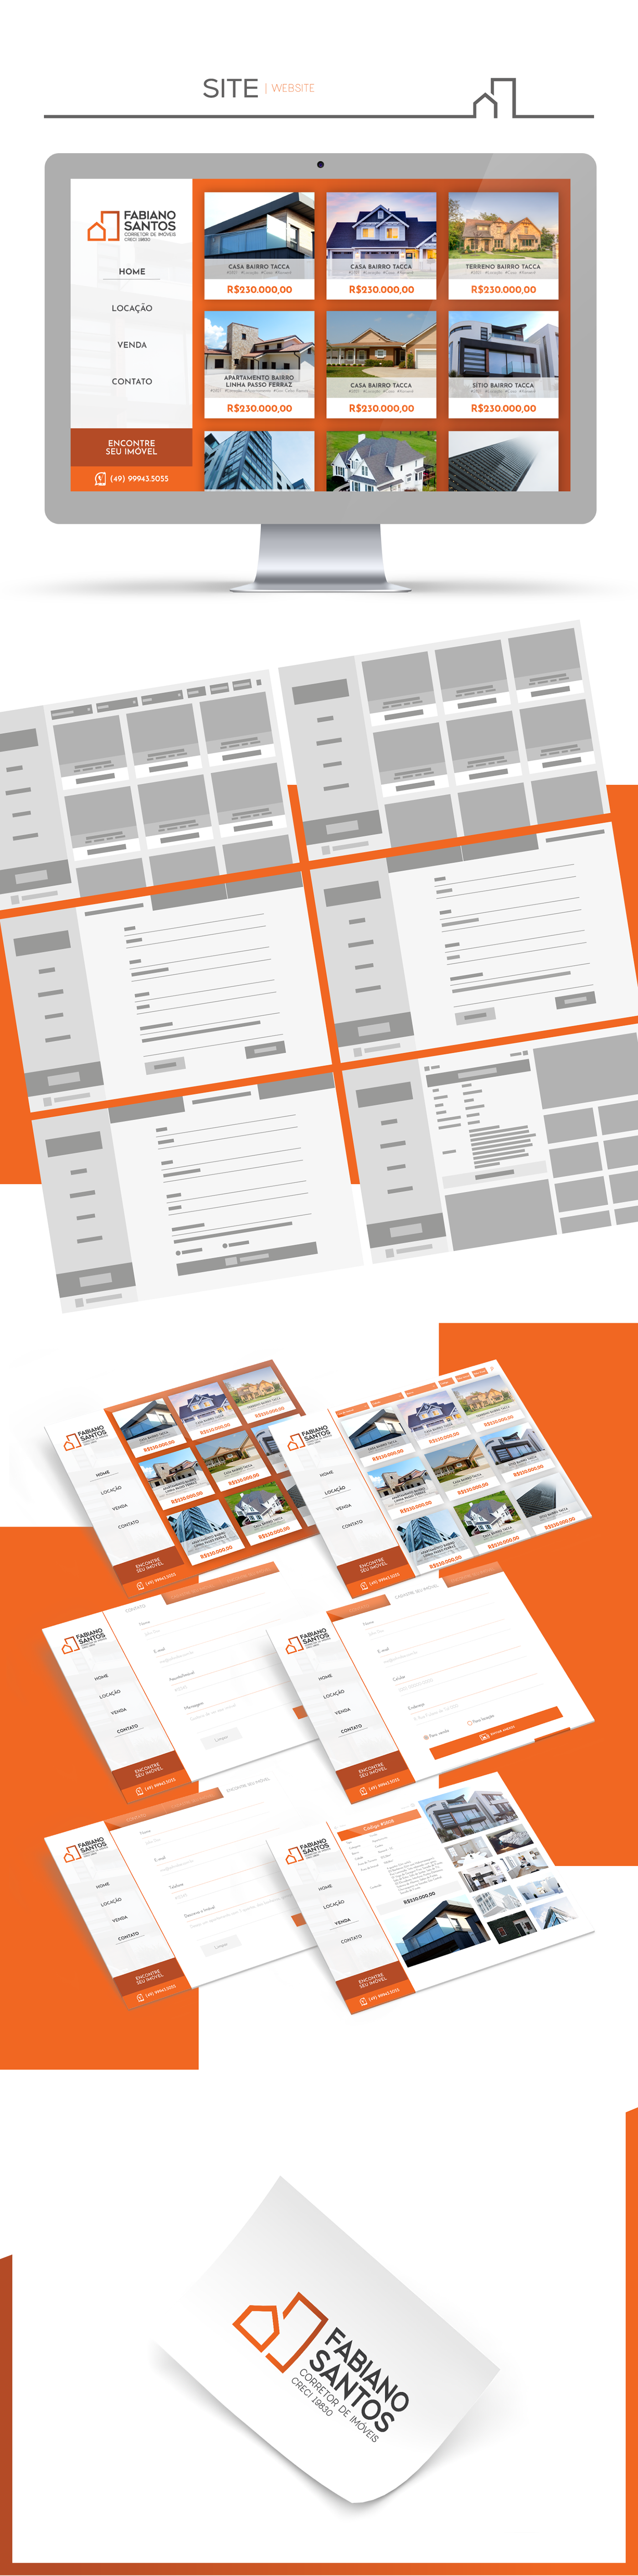 brand Website agent broker Real State realtor aleto aleto design aleto design digital fabiano santos